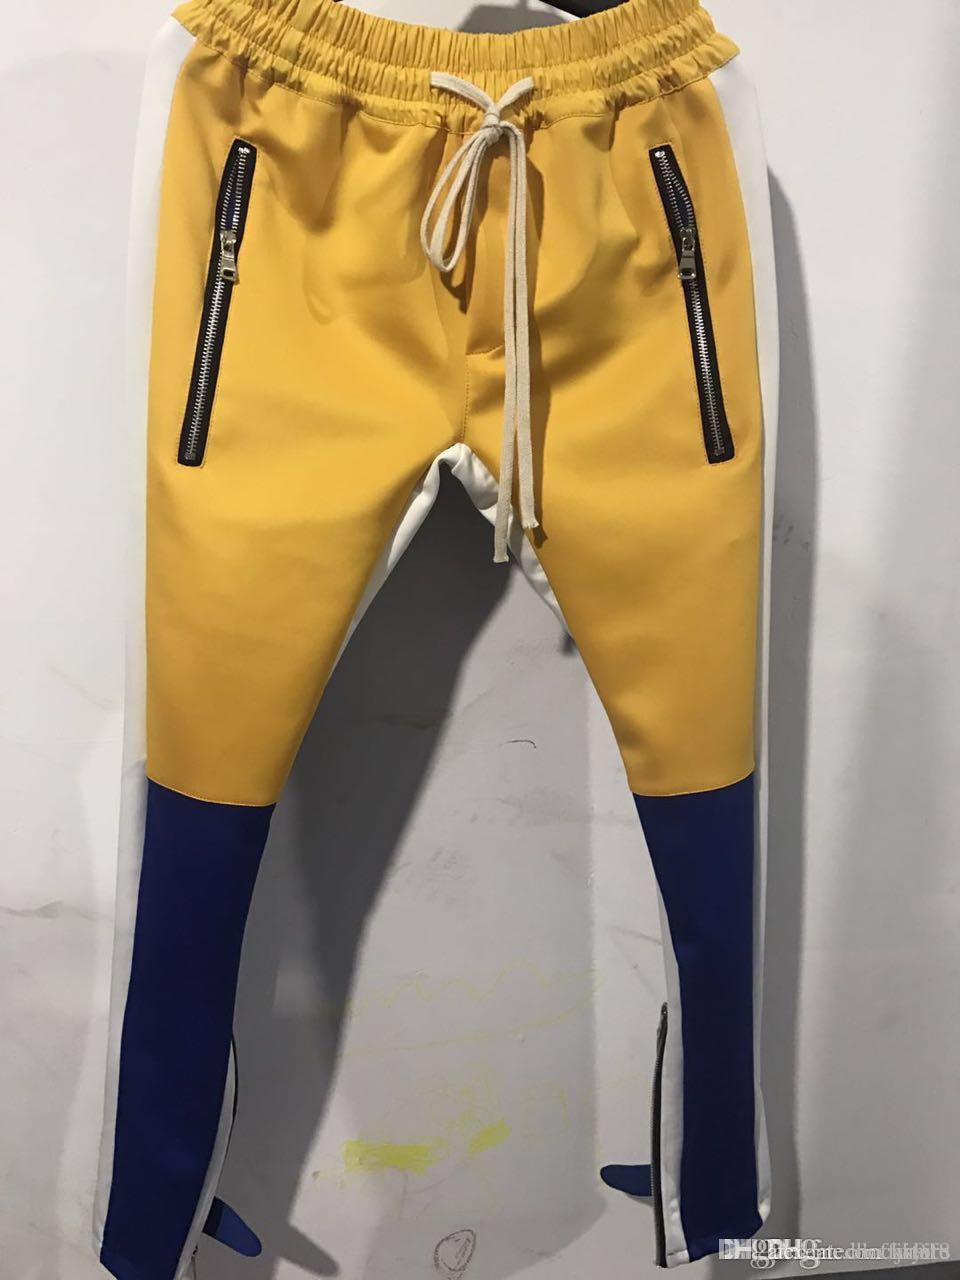 Temor de Dios FOG Justin Bieber cremallera lateral Casual Hombres pantalón de Hiphop del basculador Pantalones deportivos Sportwear S-XXL